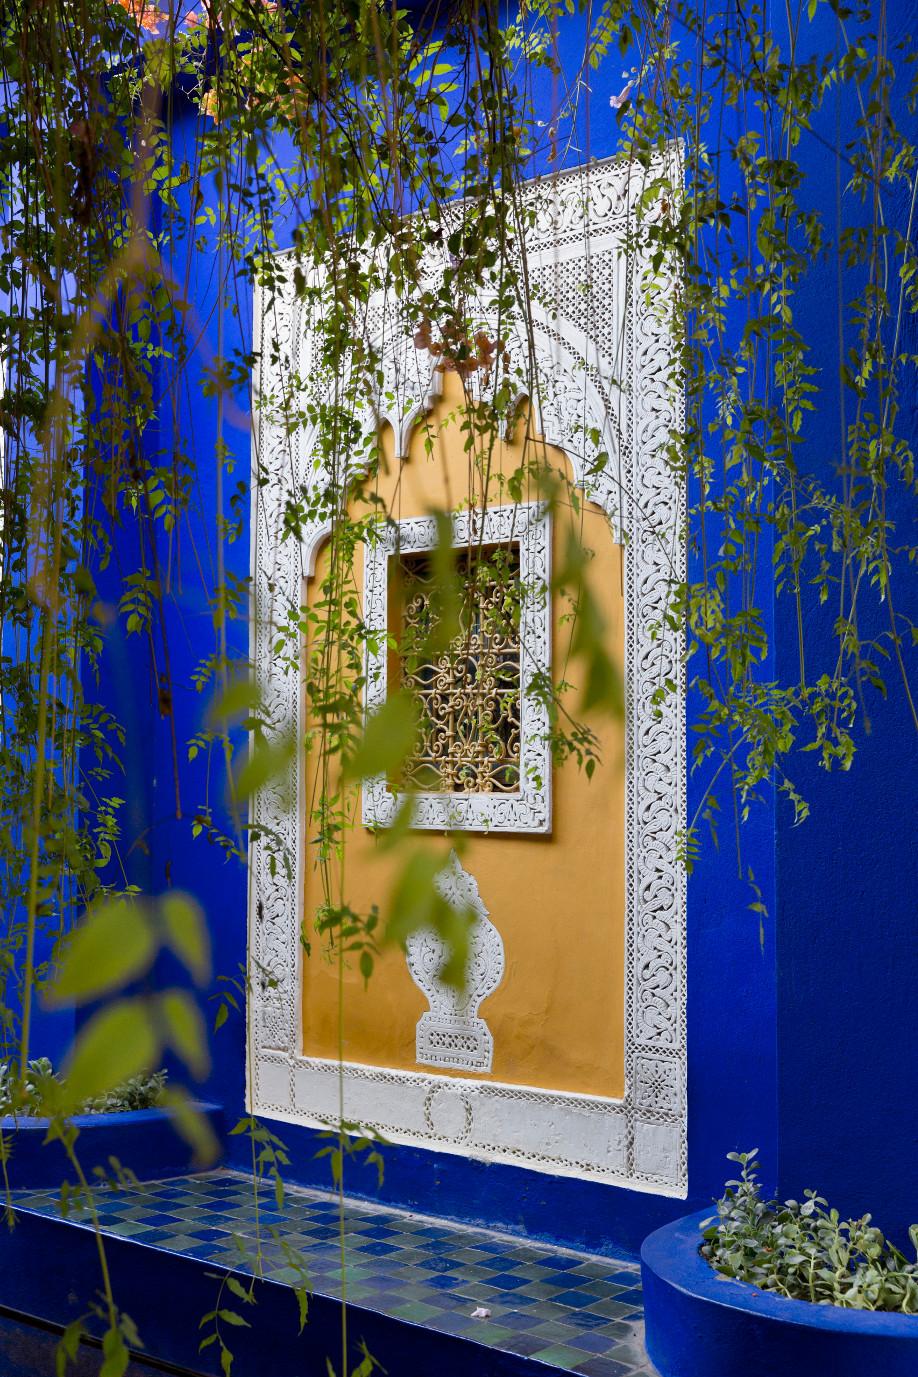 Le jardin majorelle le jardin bleu de marrakech westwing for Jardin majorelle